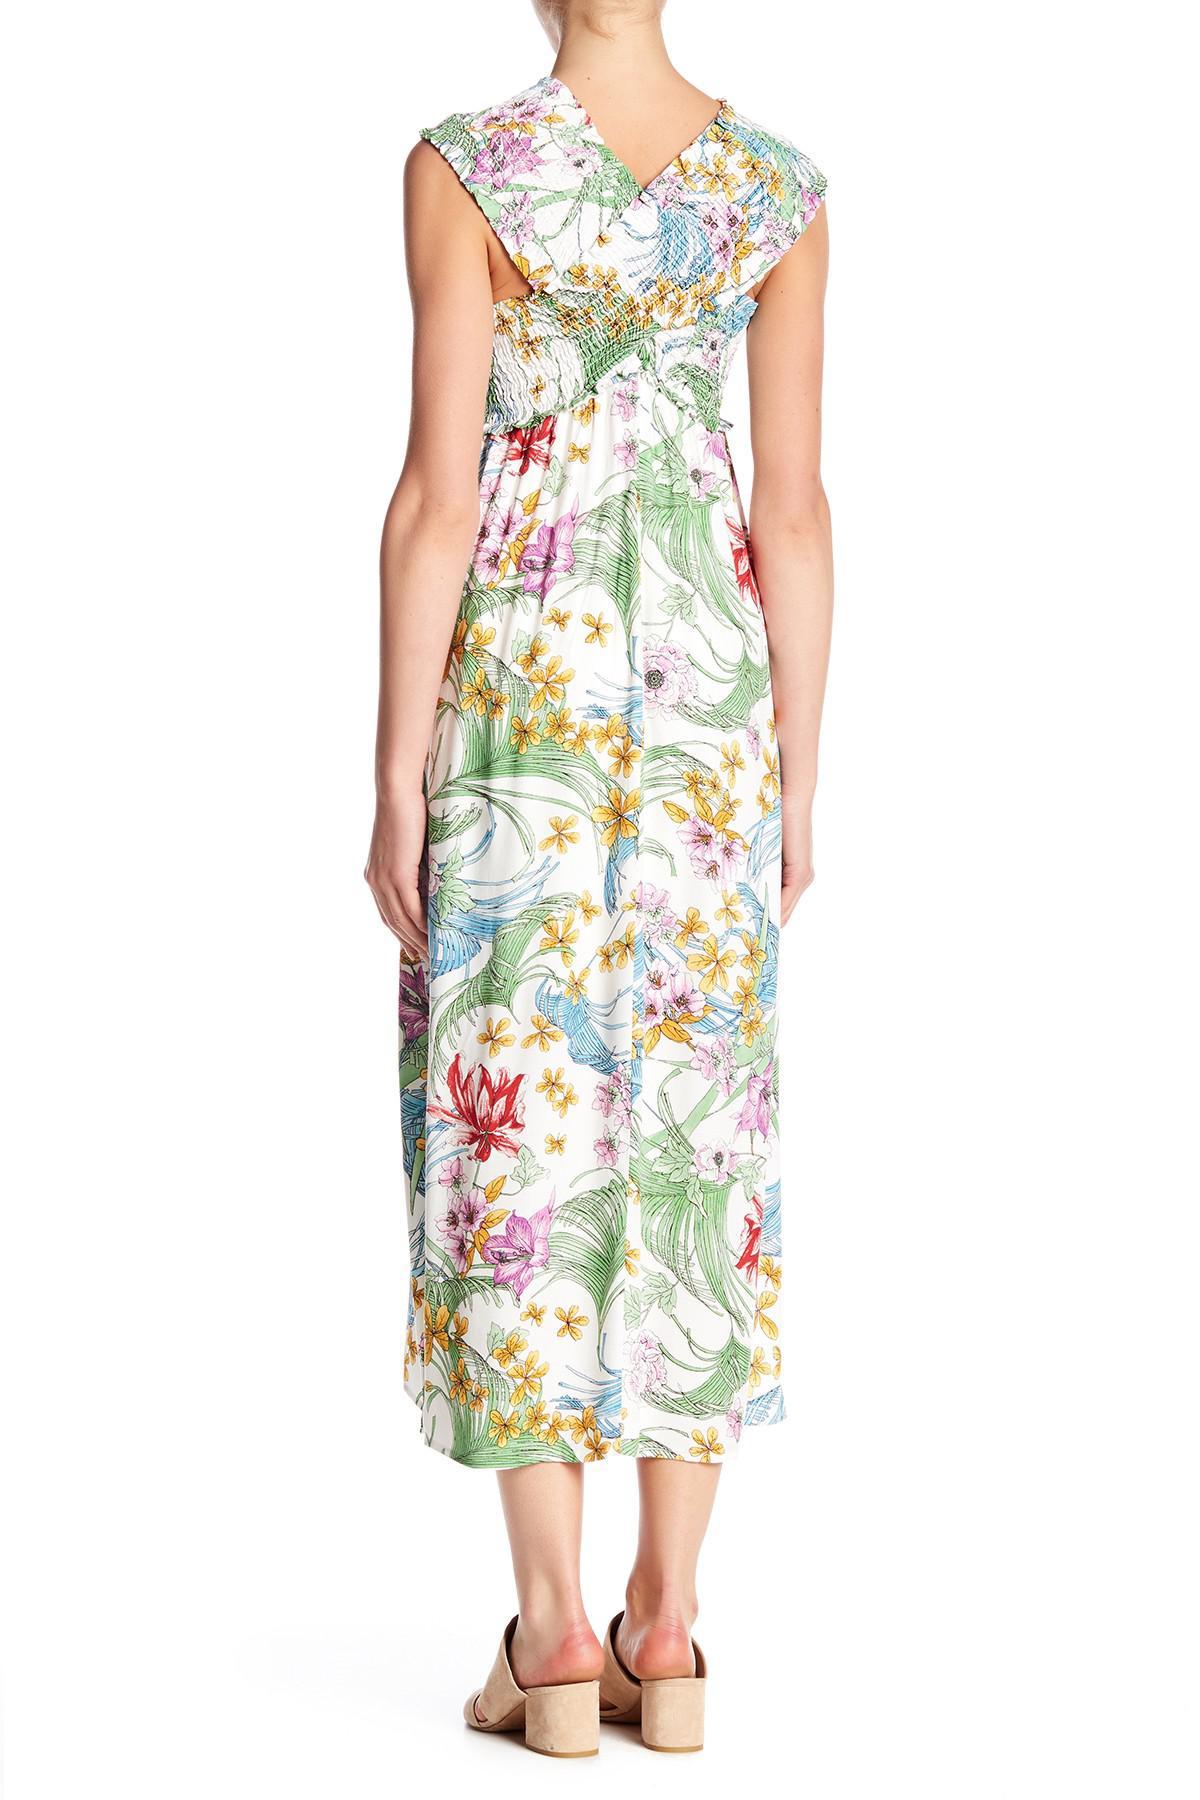 c054075a4e8c1 Lyst - Lush Smocked Bodice Maxi Dress